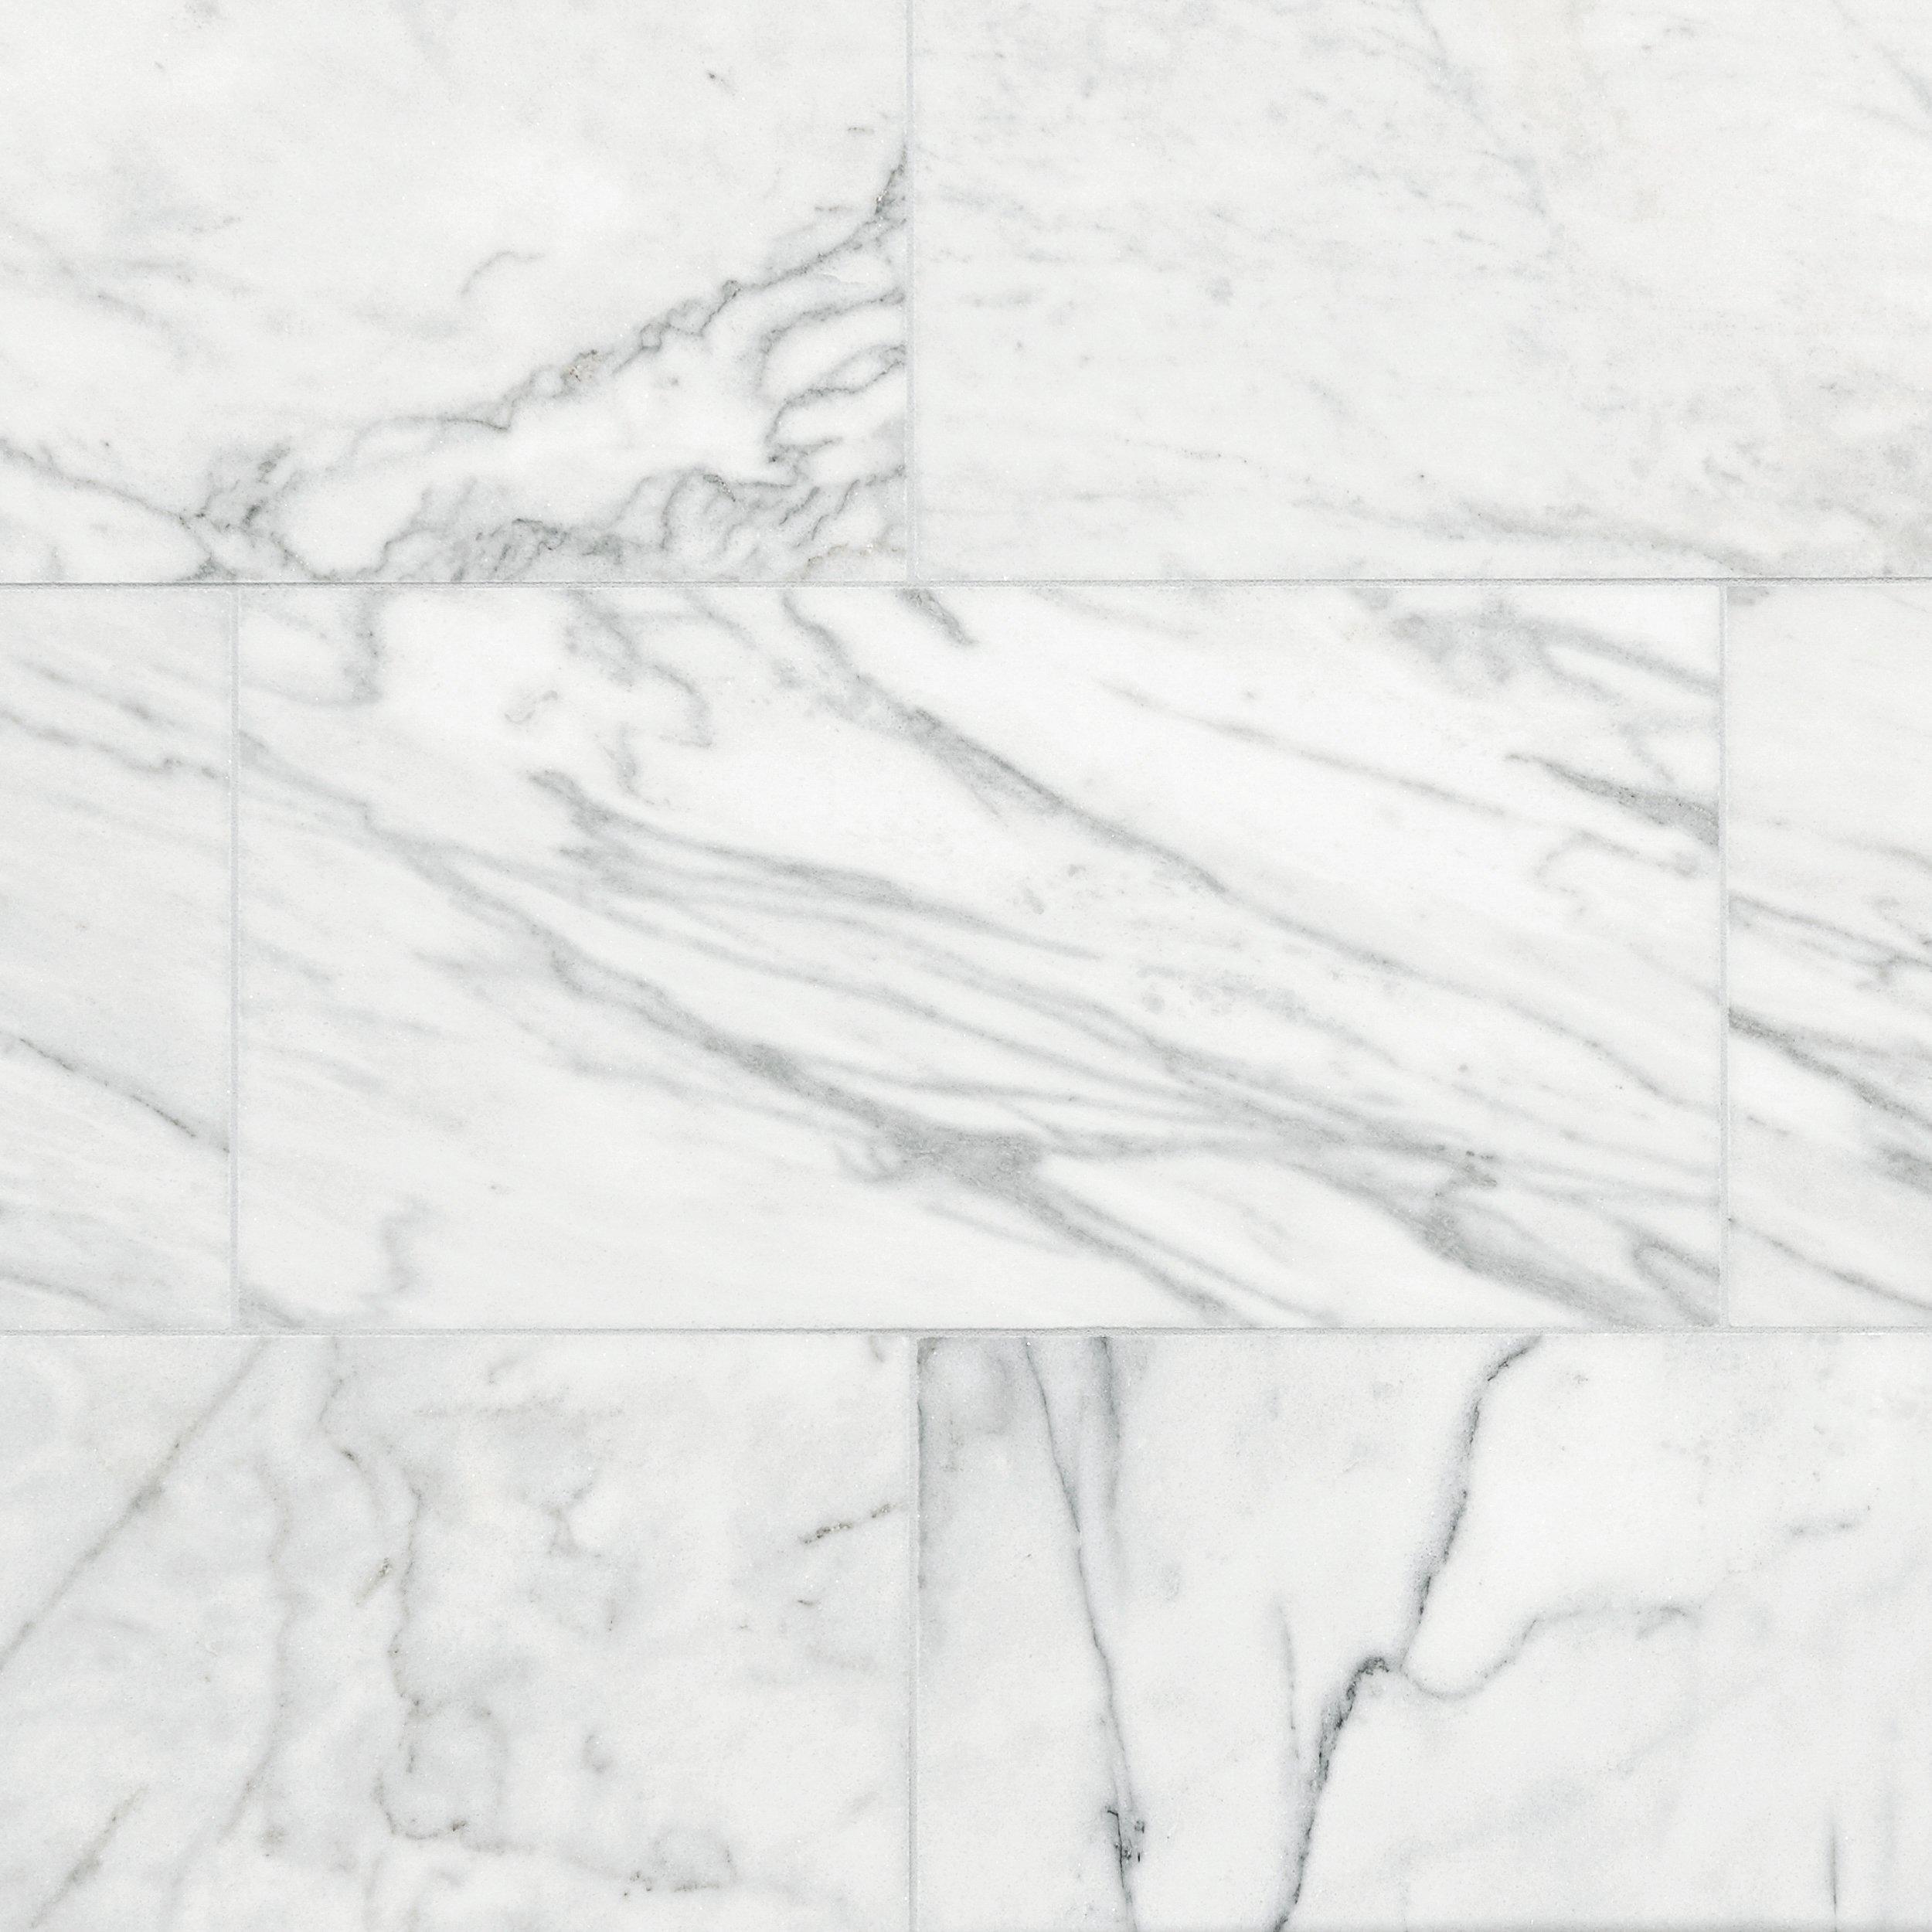 Ocean White Marble Tile 12 x 24 100139351 Floor and Decor